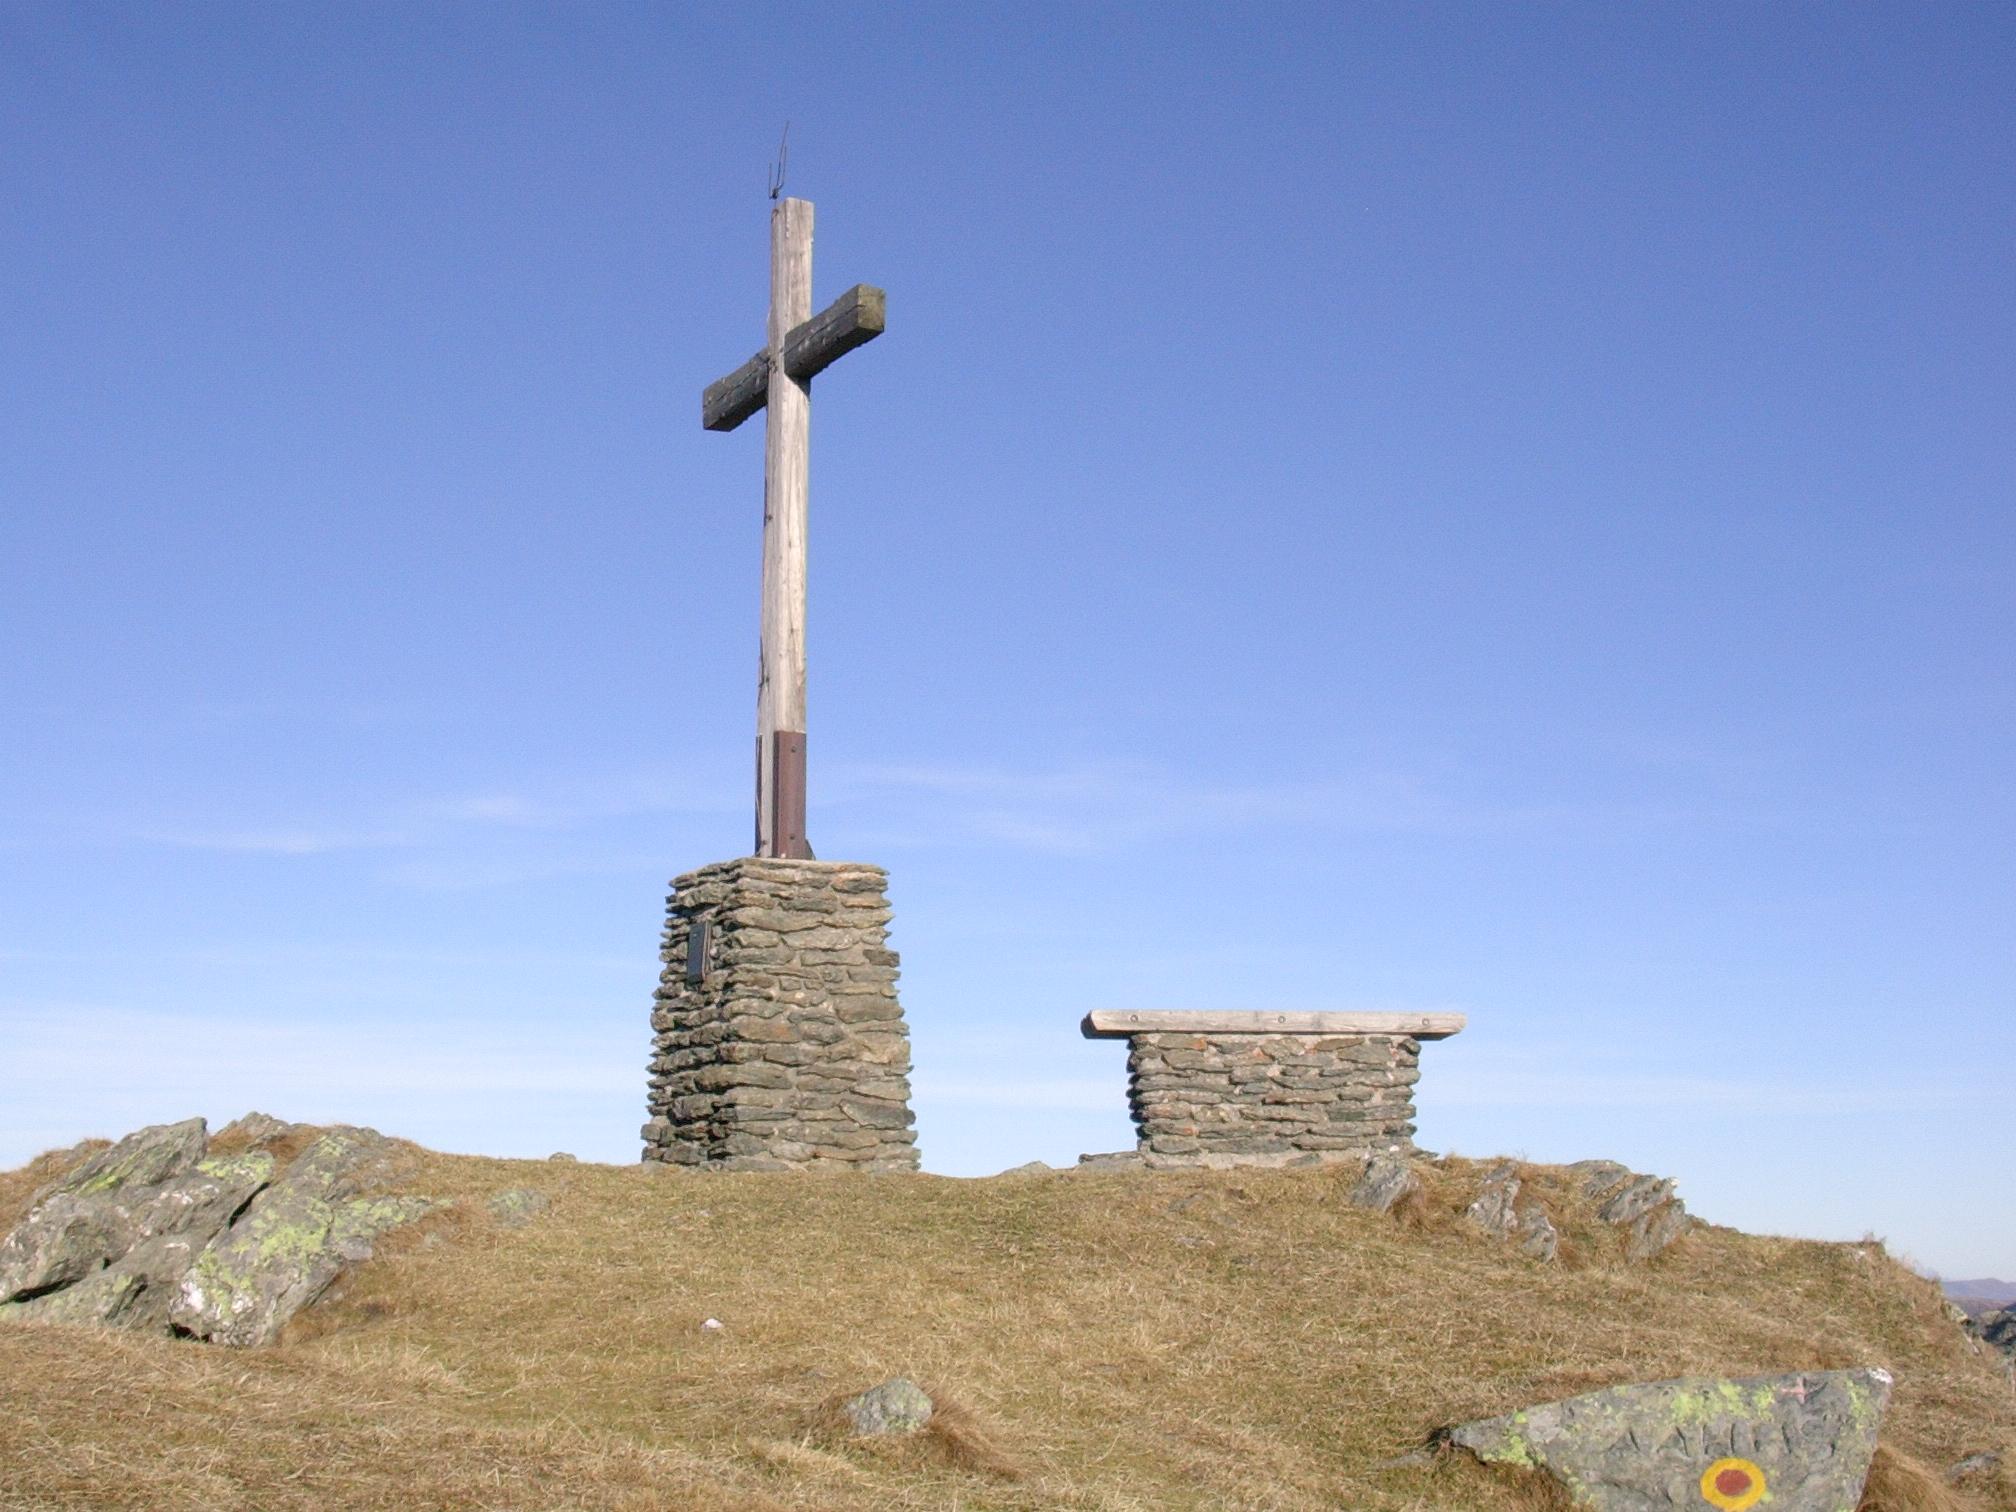 Gipfelkreuz am Sonnjoch